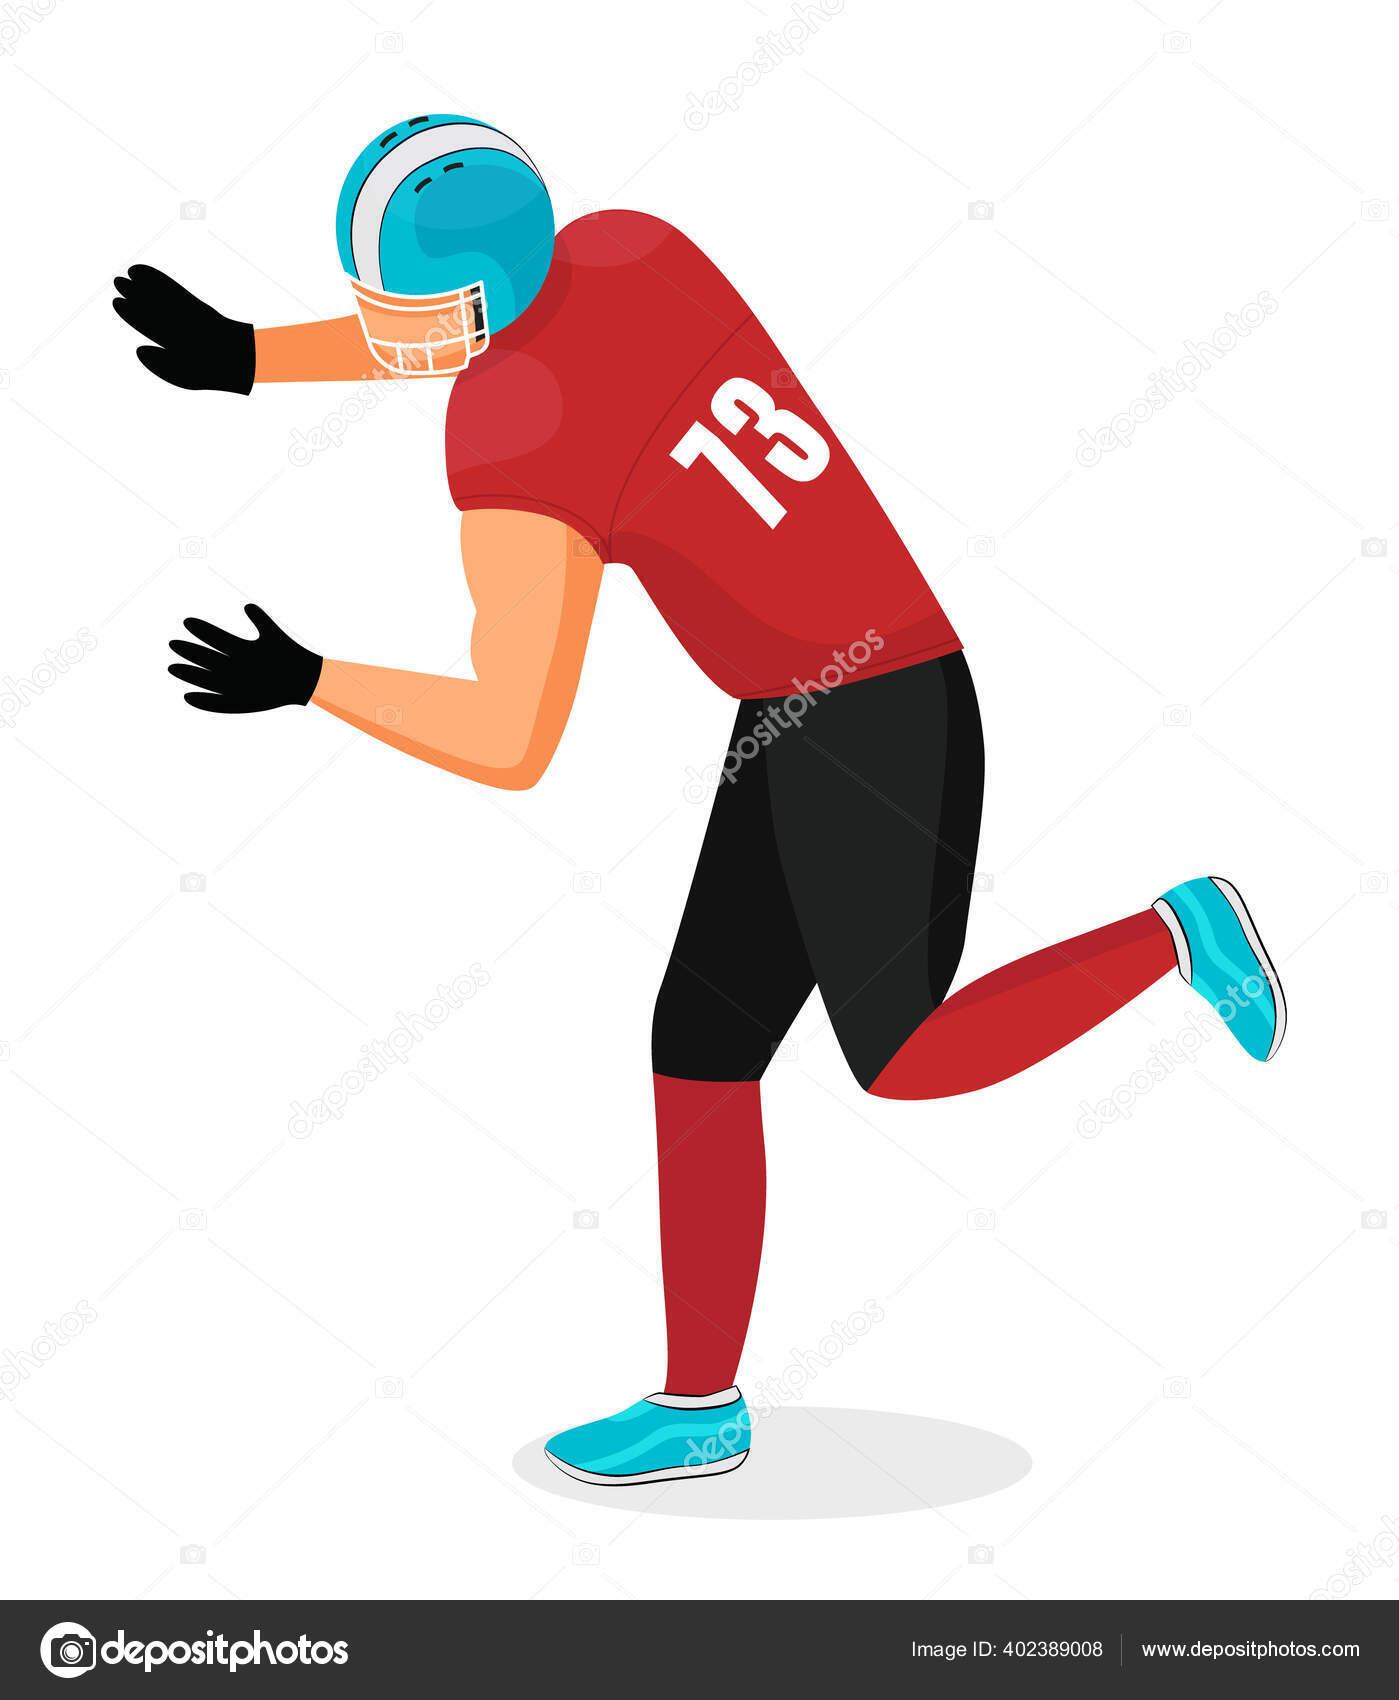 Pemain Olahraga Permainan Tradisional Sepak Bola Amerika Stok Vektor C Robuart 402389008